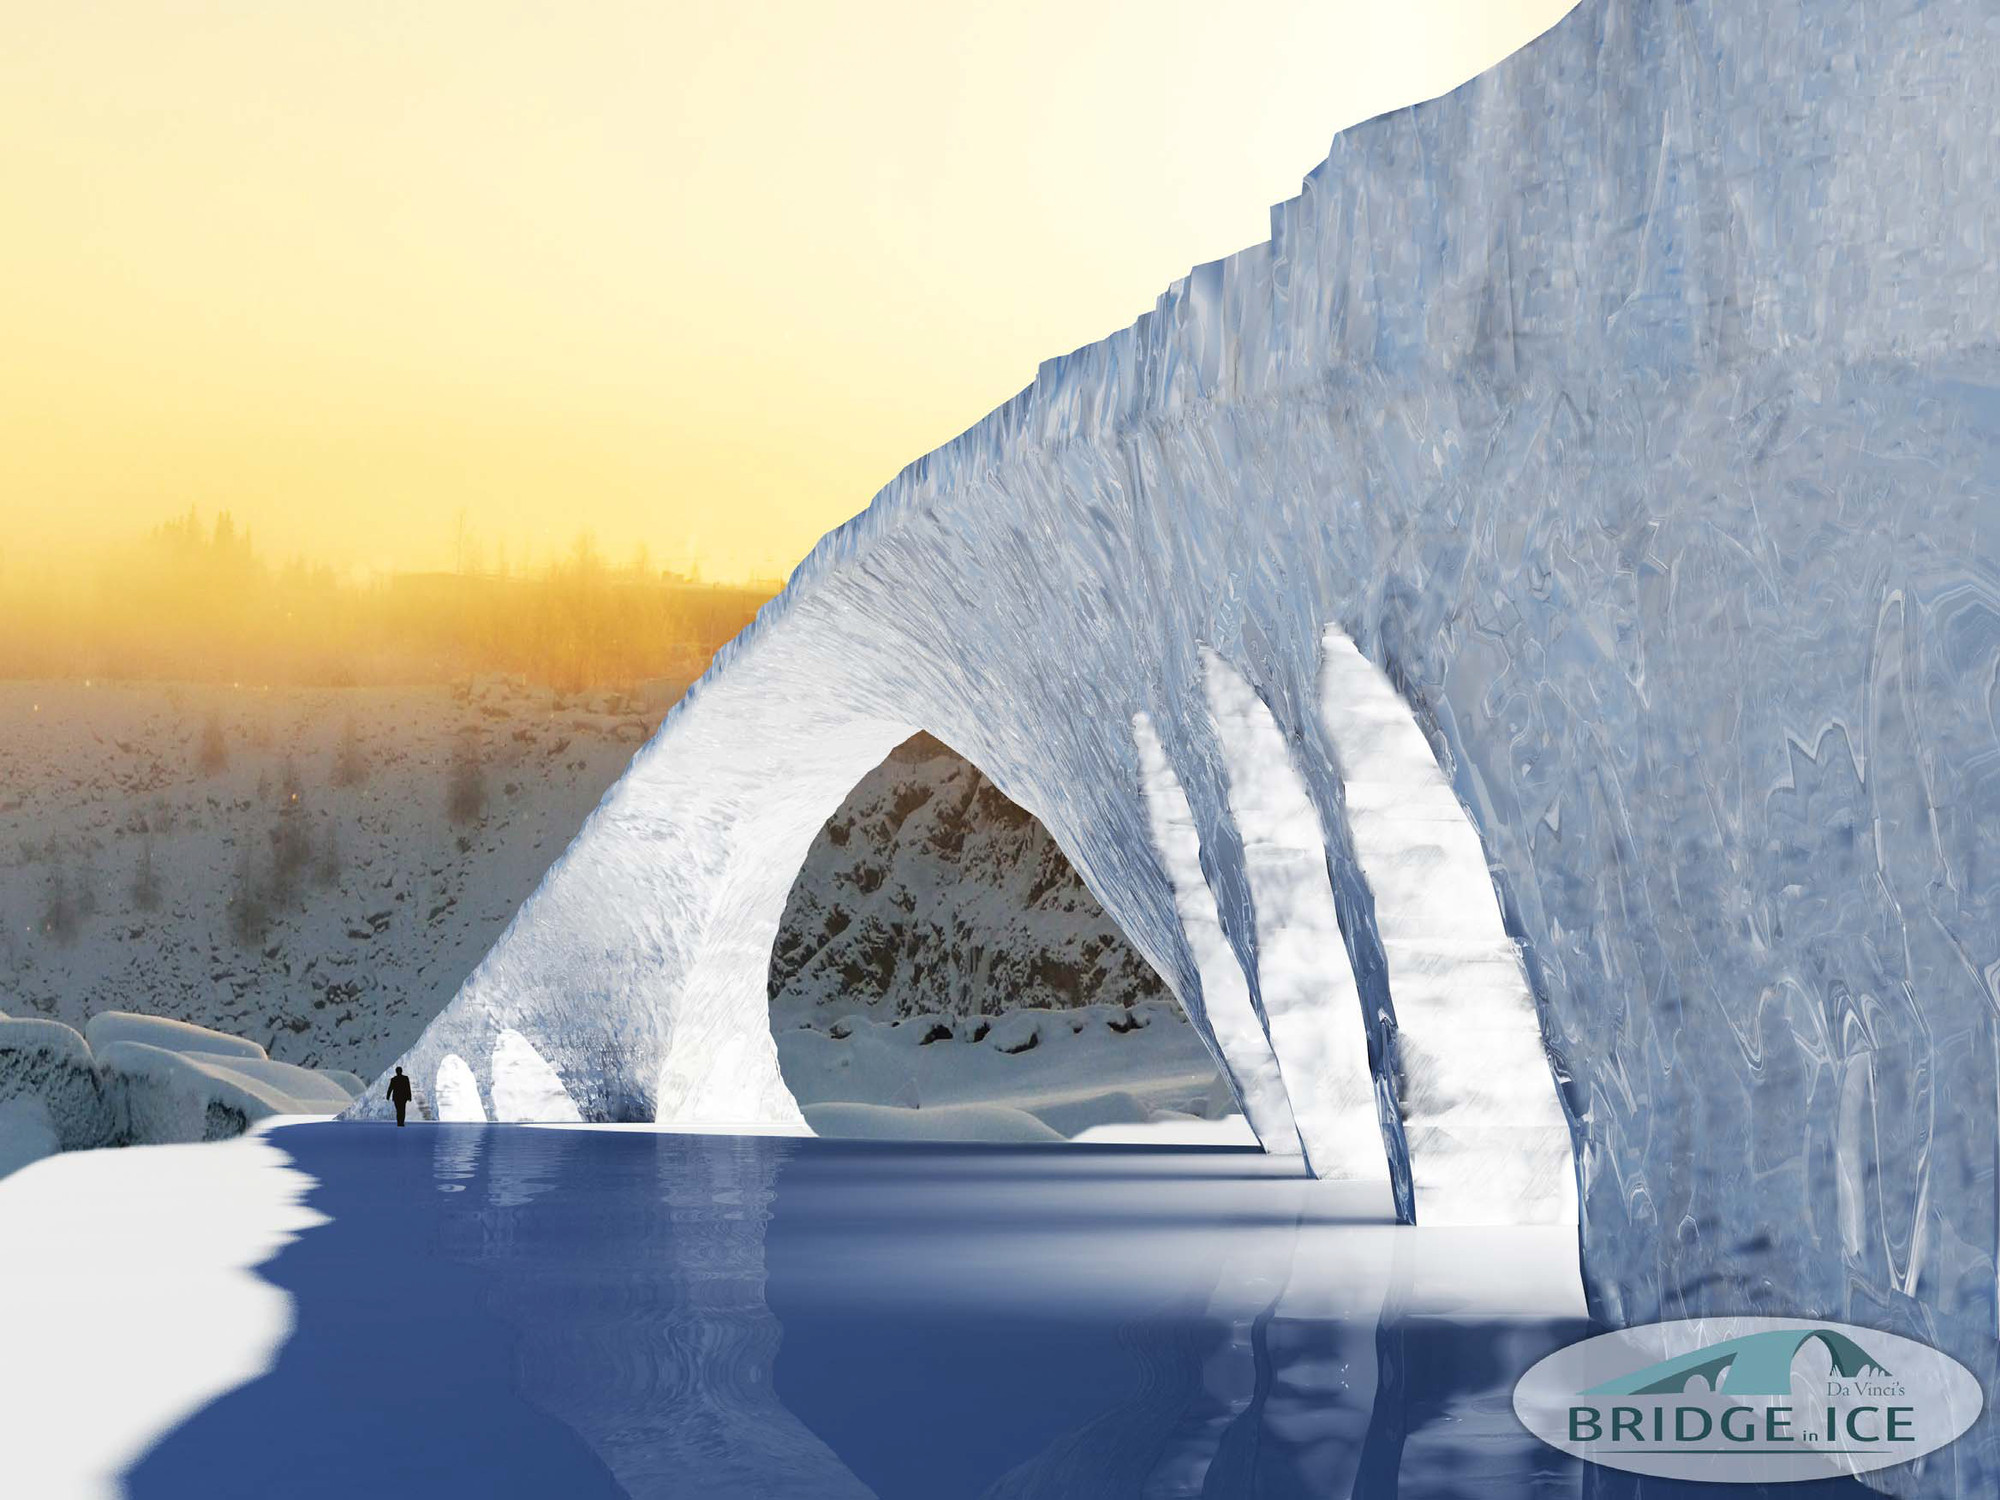 TU/e Students to Build Leonardo da Vinci's Bridge Out of Ice, Courtesy of Eindhoven University of Technology